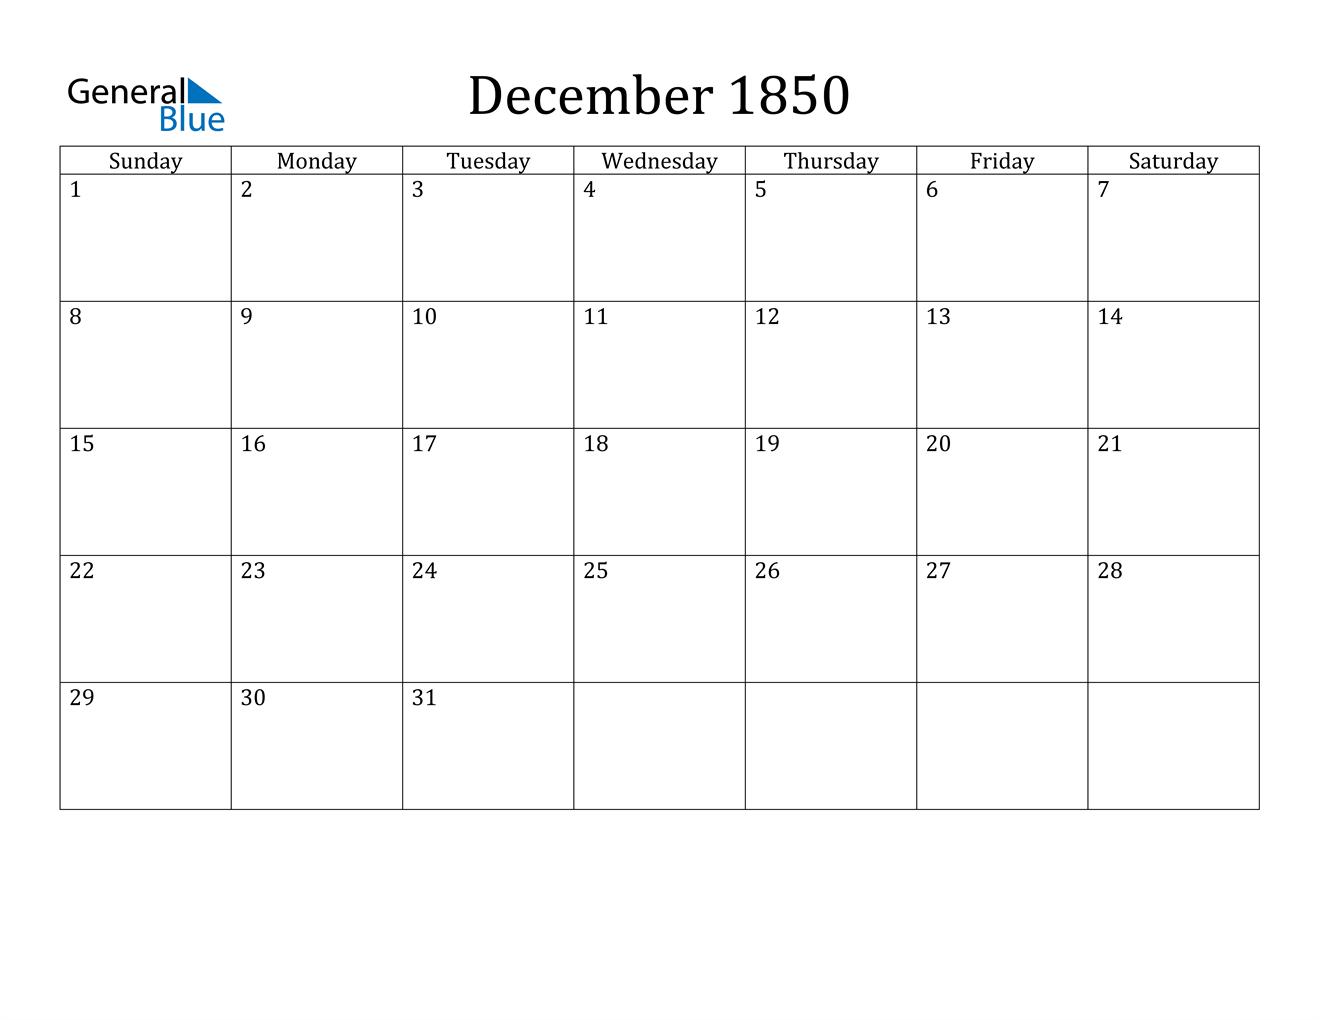 Image of December 1850 Calendar